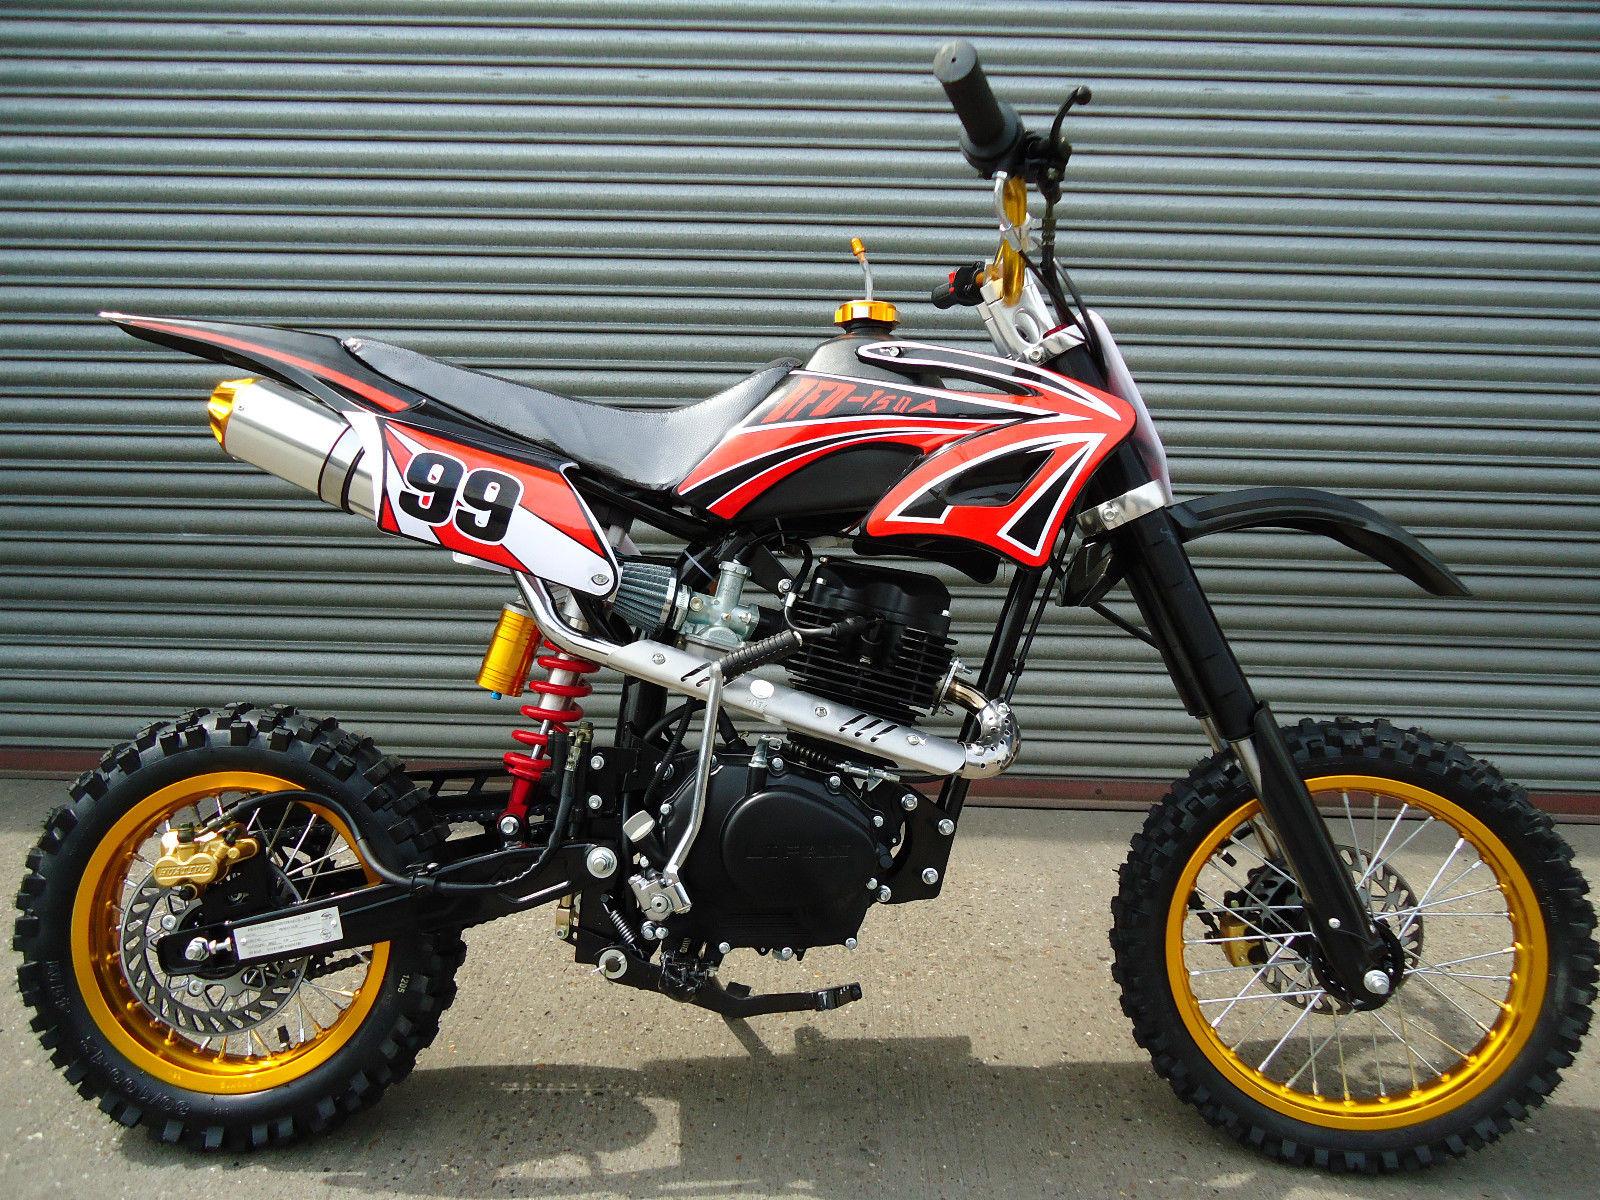 New Dmx 150cc Pit Bikes Dirt Bikes Pit Bike 125cc 140cc 160cc Pit Bikes